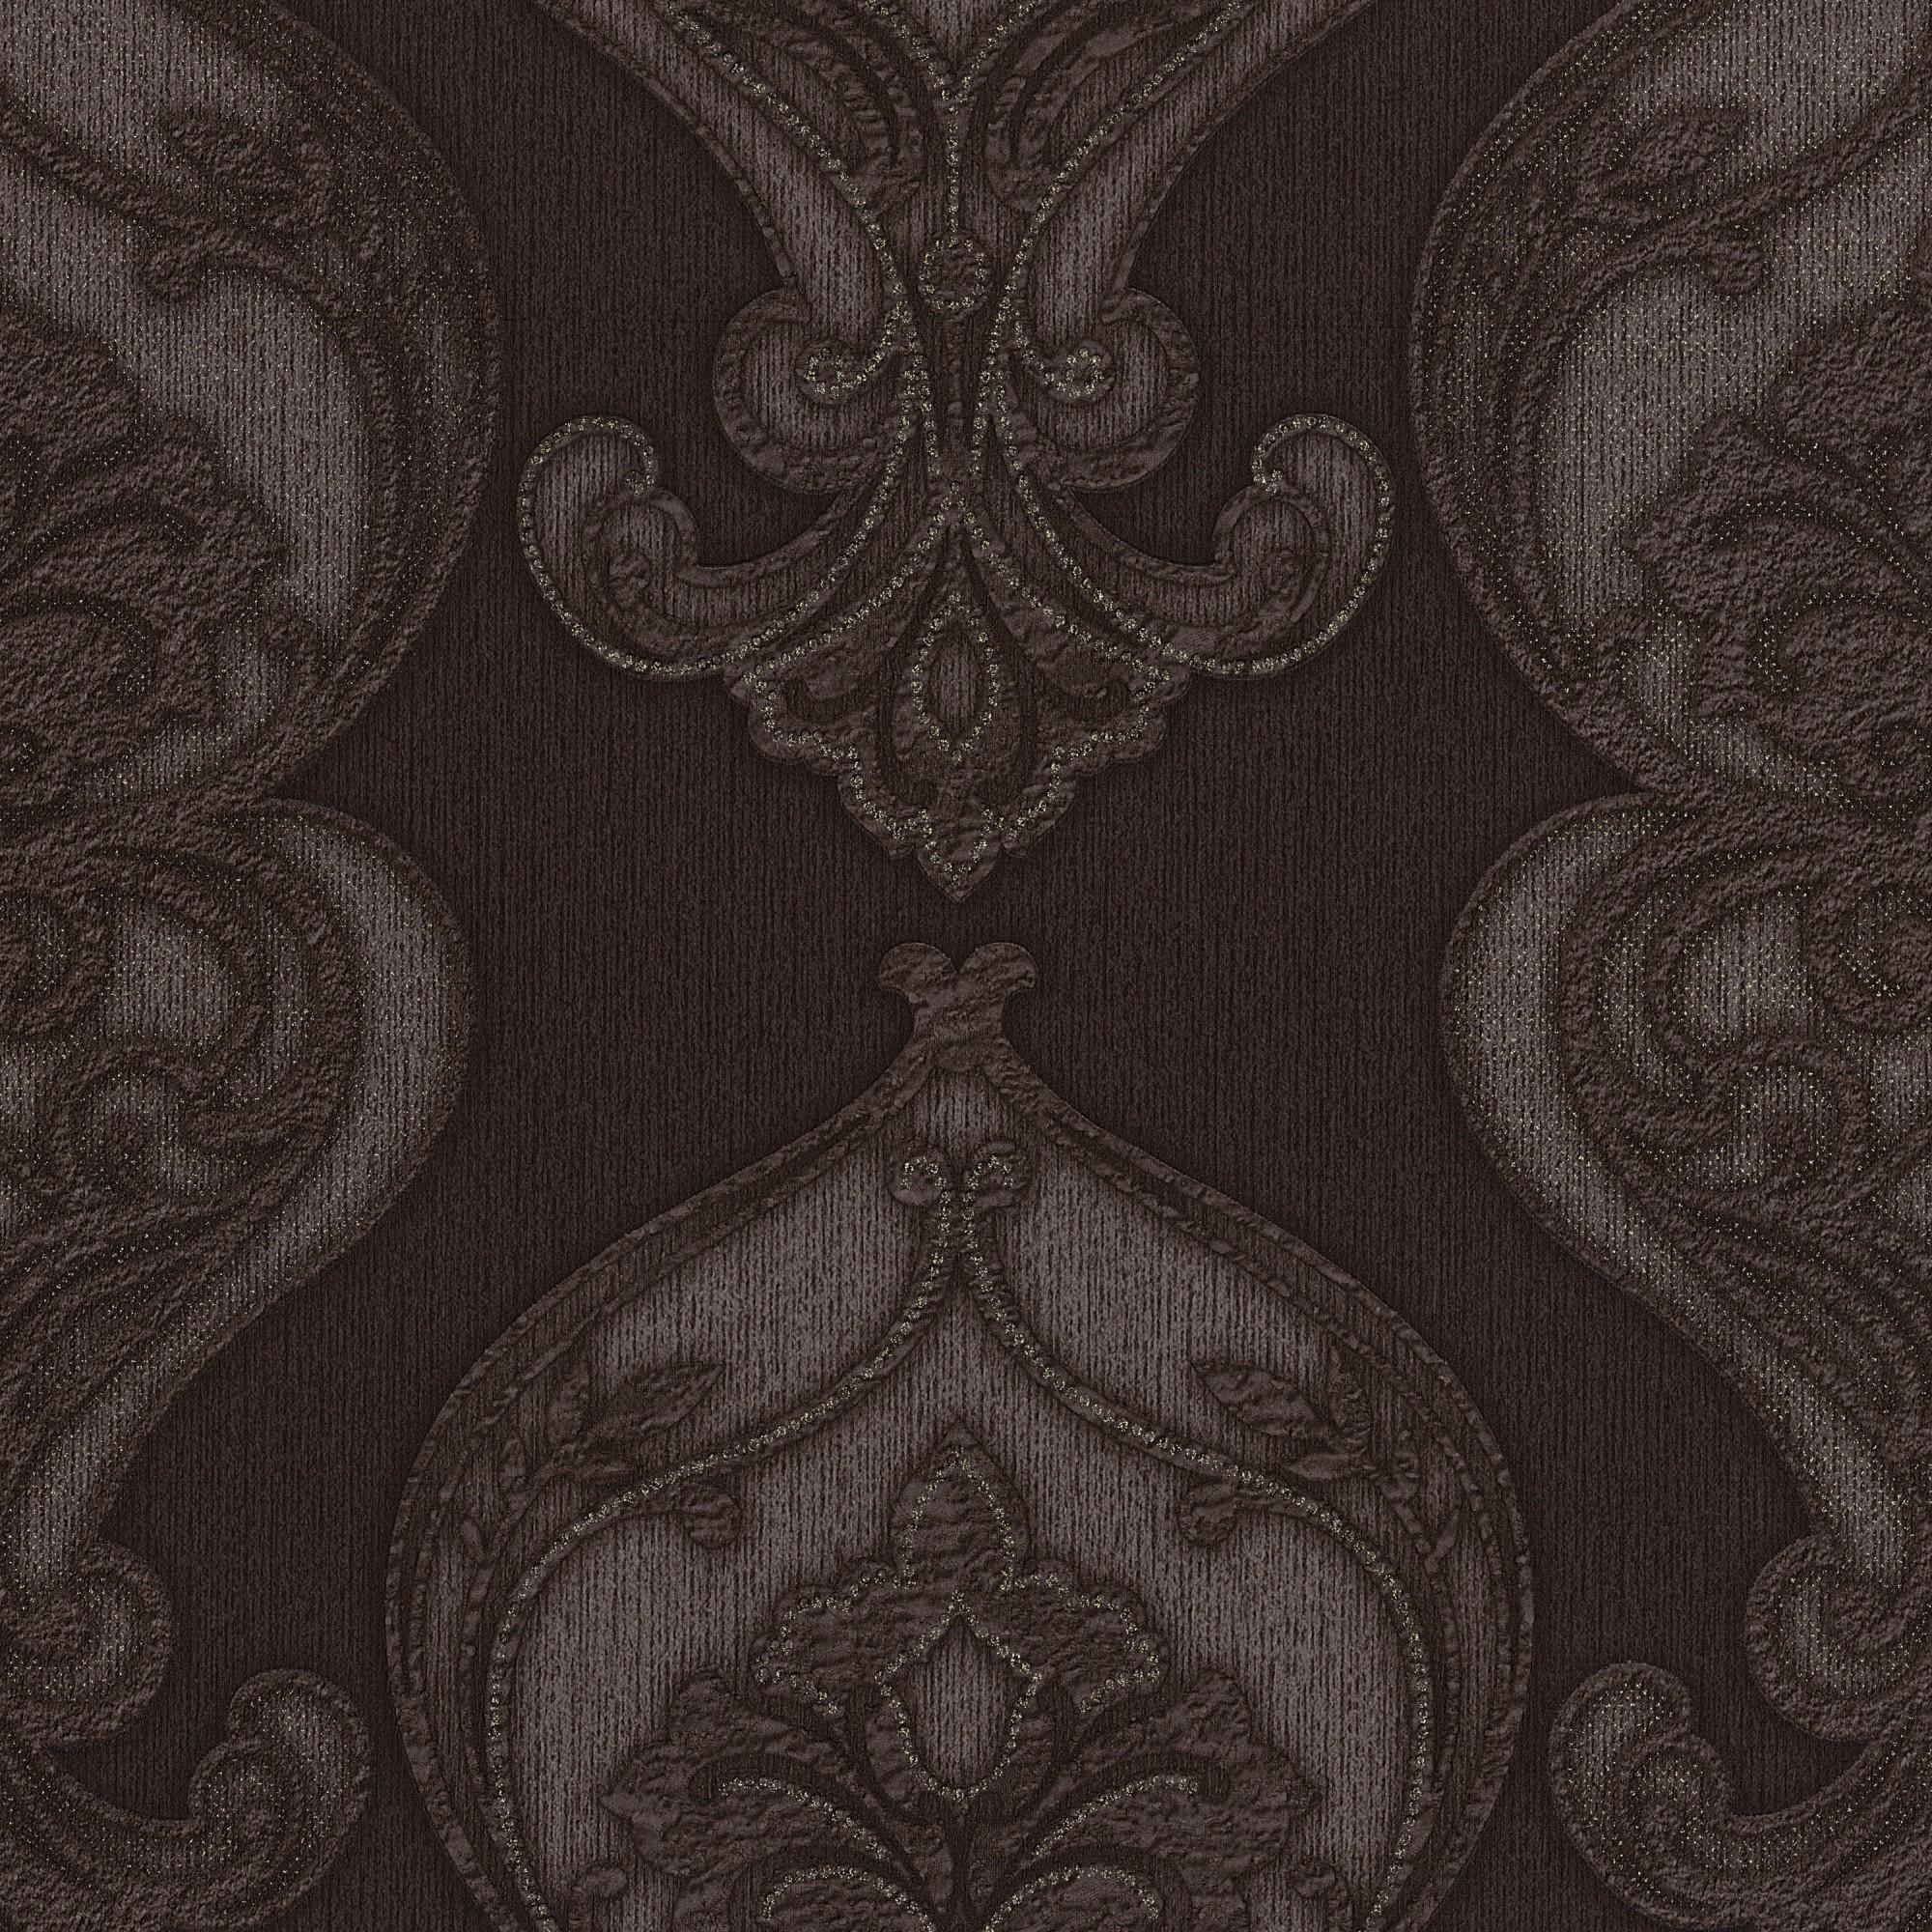 dieter bohlen studio line vliestapete 02426 20 0242620. Black Bedroom Furniture Sets. Home Design Ideas